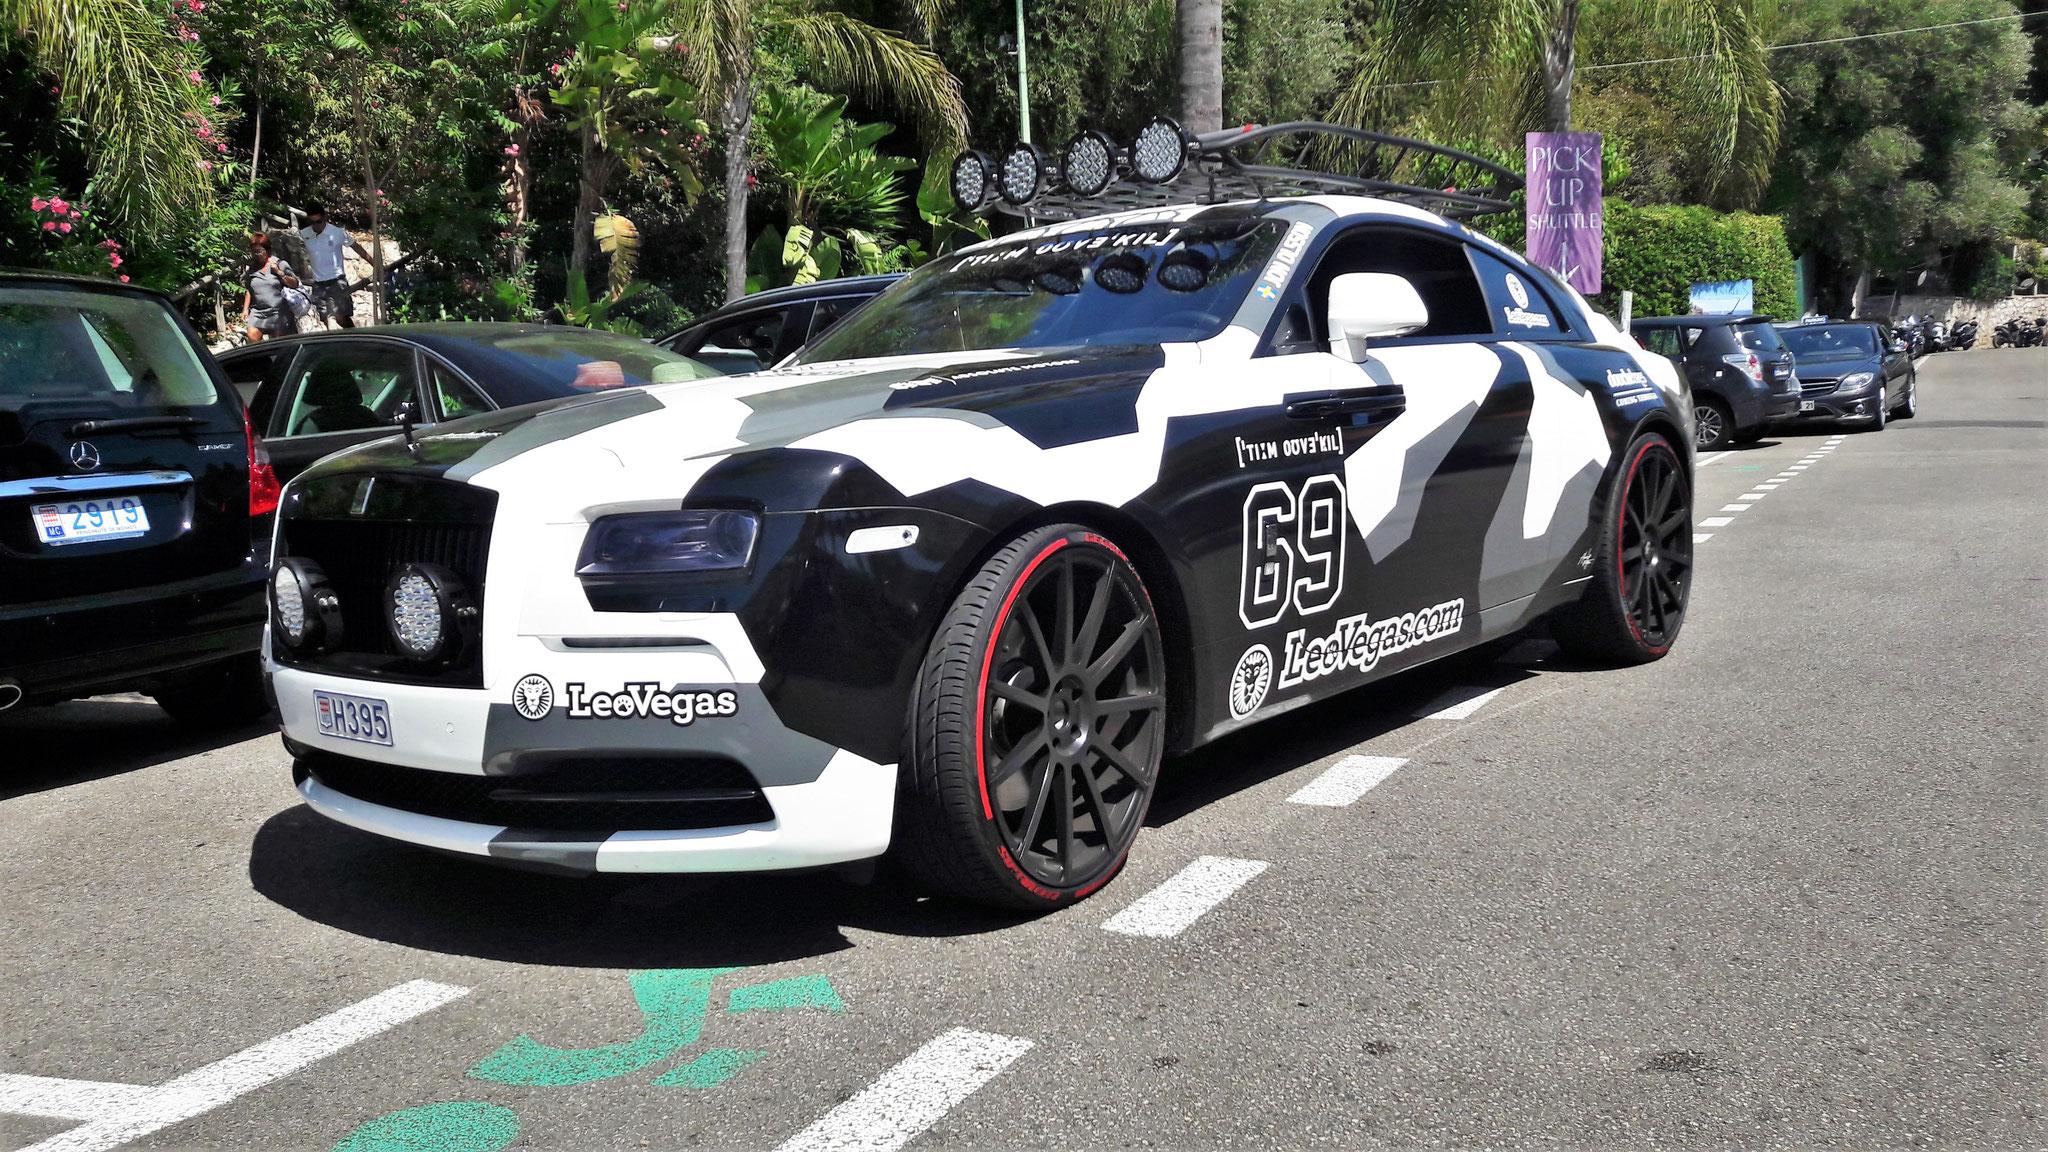 Rolls Royce Wraith Jon Olsson - H395 (MC)